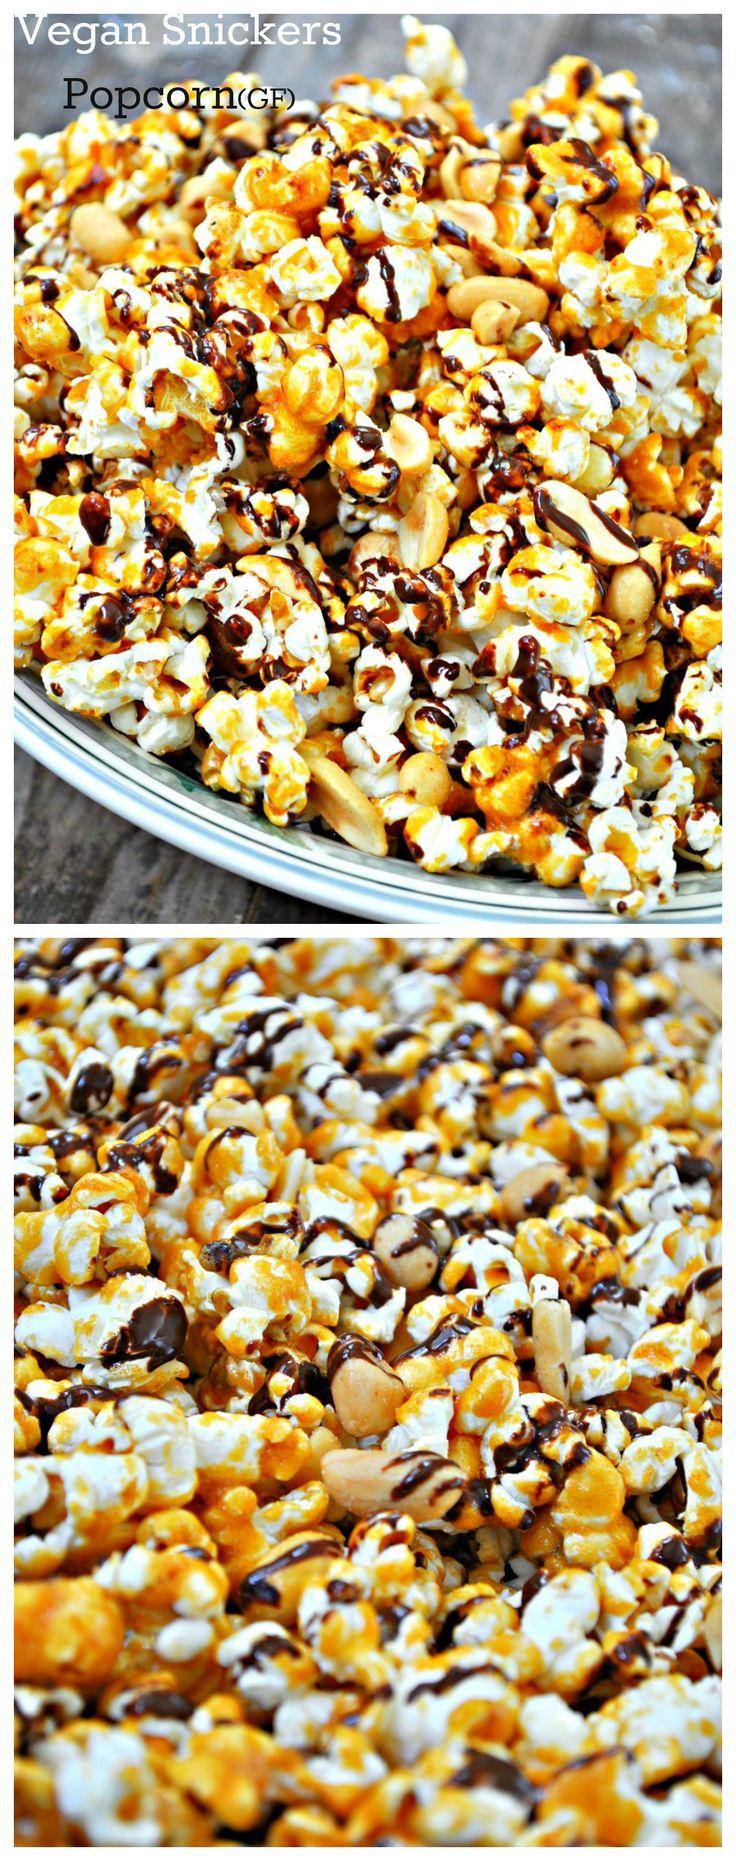 Vegan Snickers Popcorn